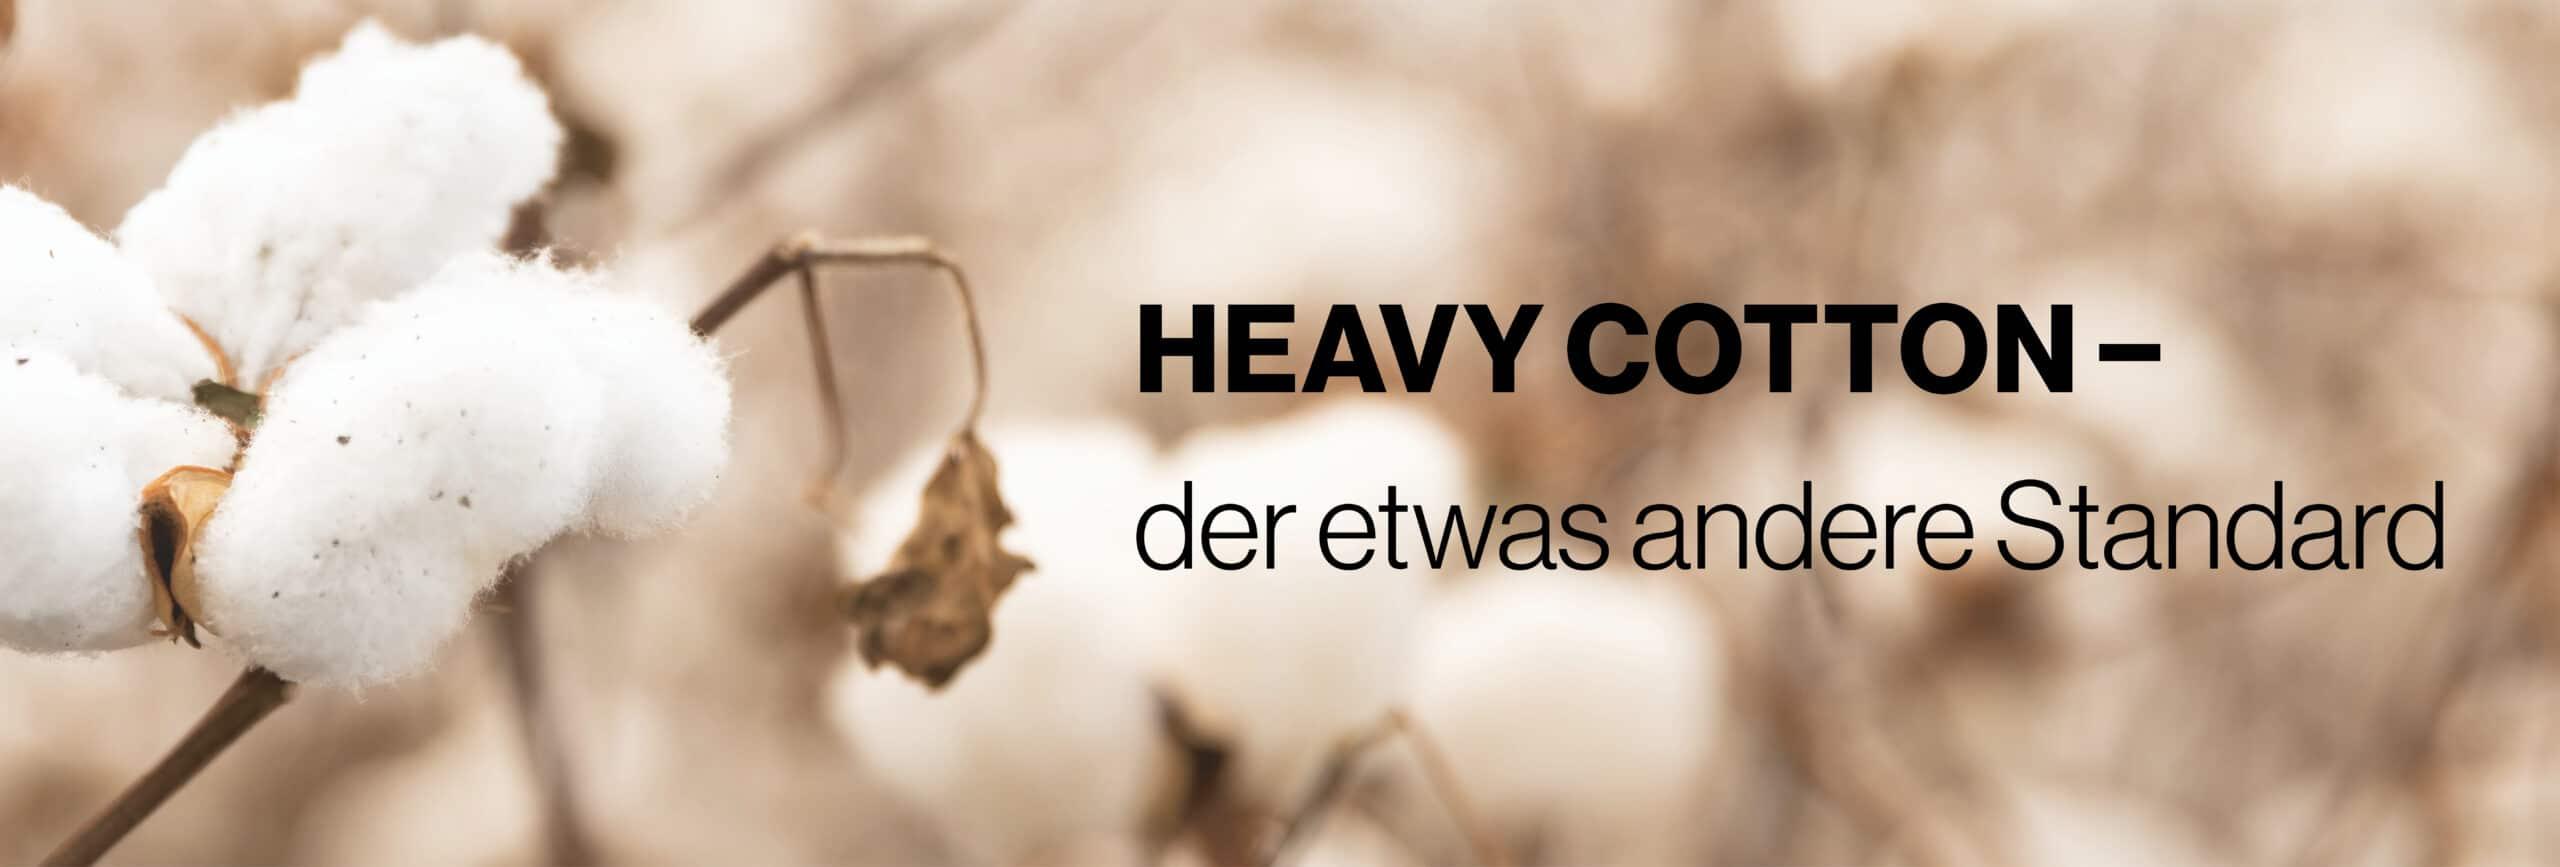 Antje - Heavy Cotton